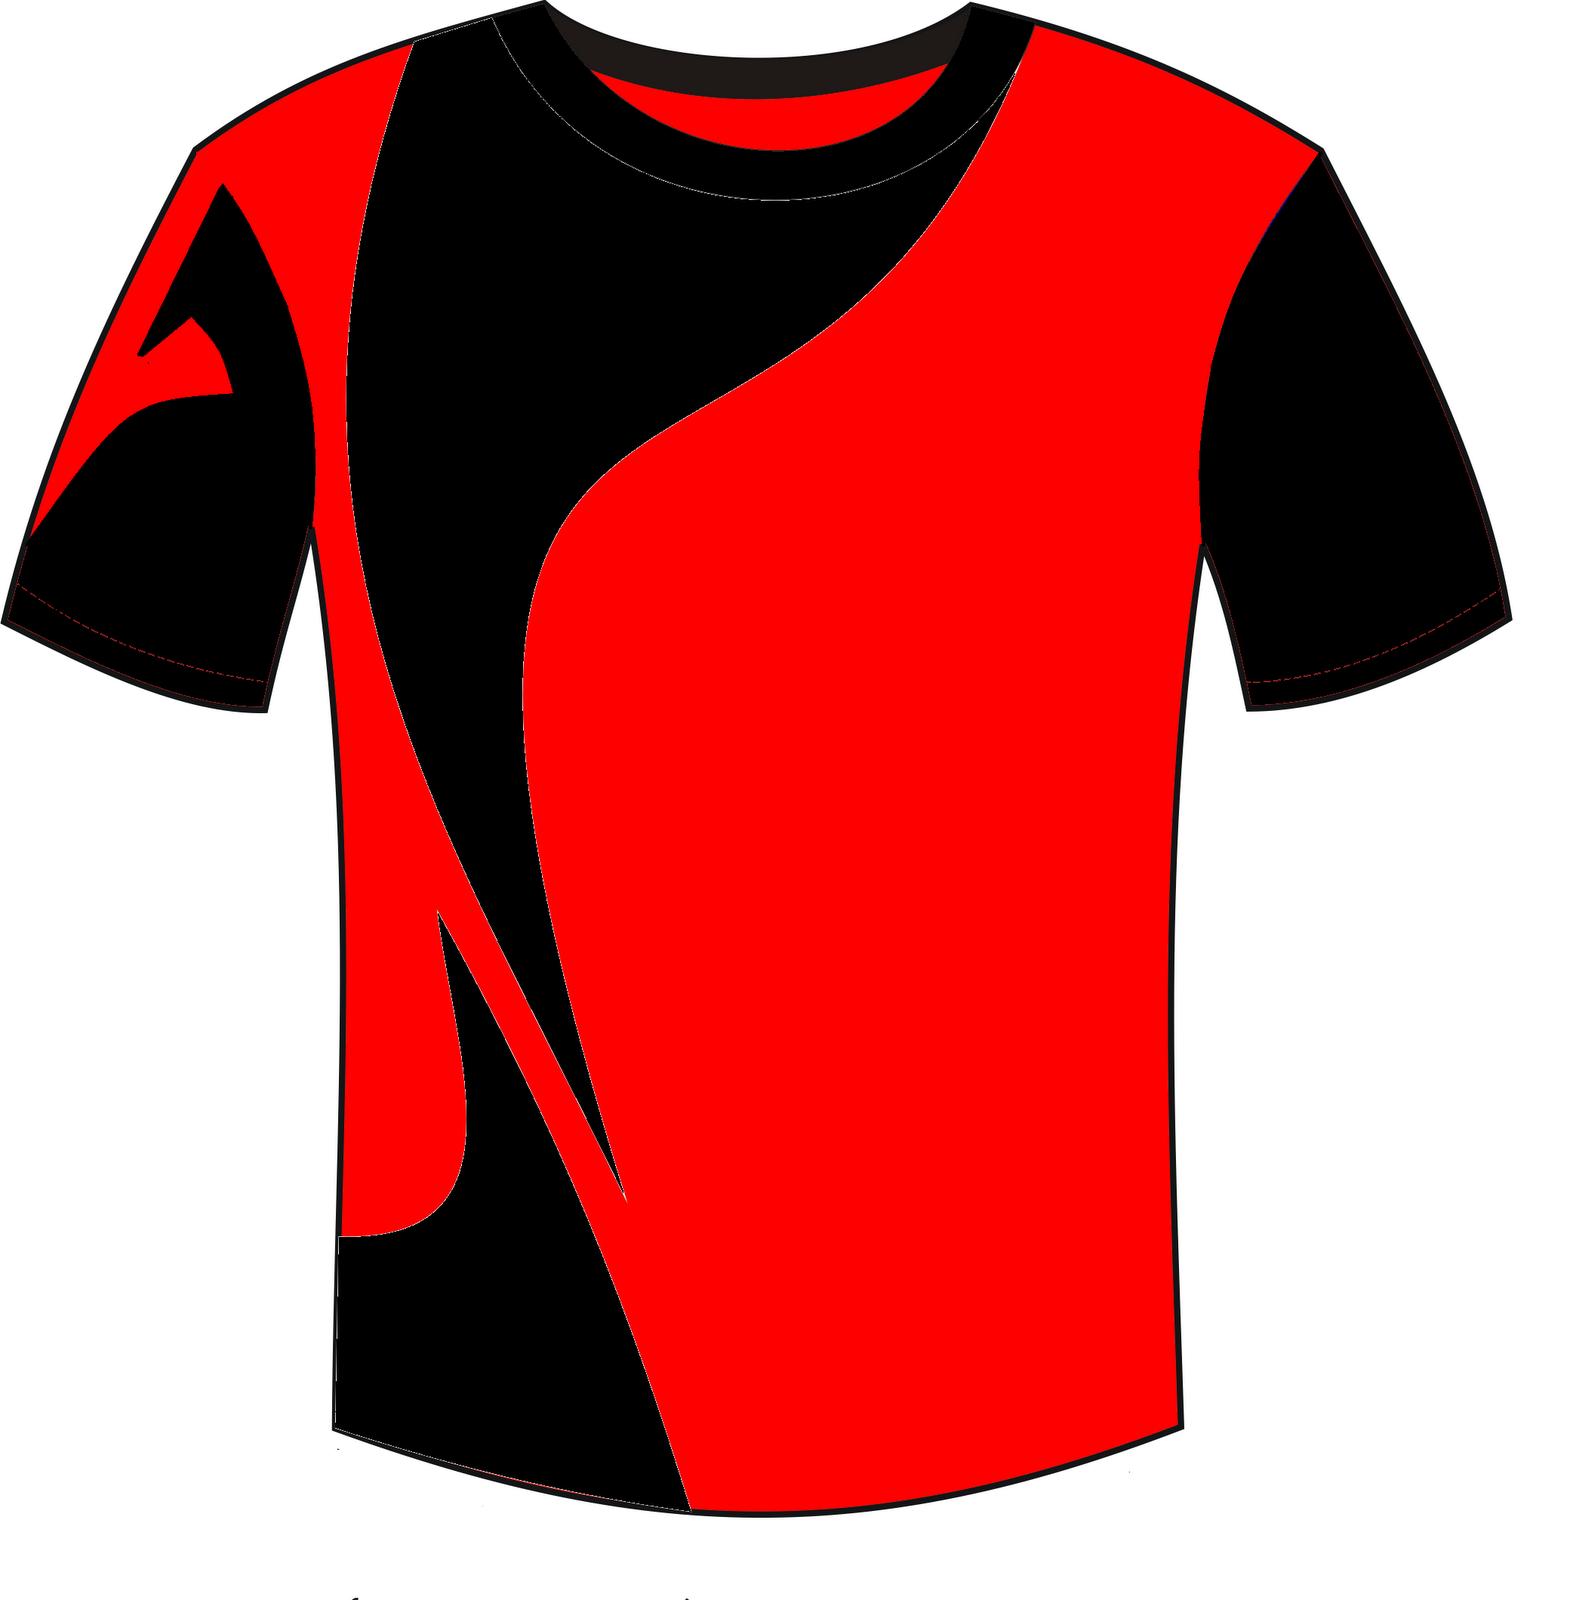 Gambar Desain Logo Futsal  Koleksi Gambar HD